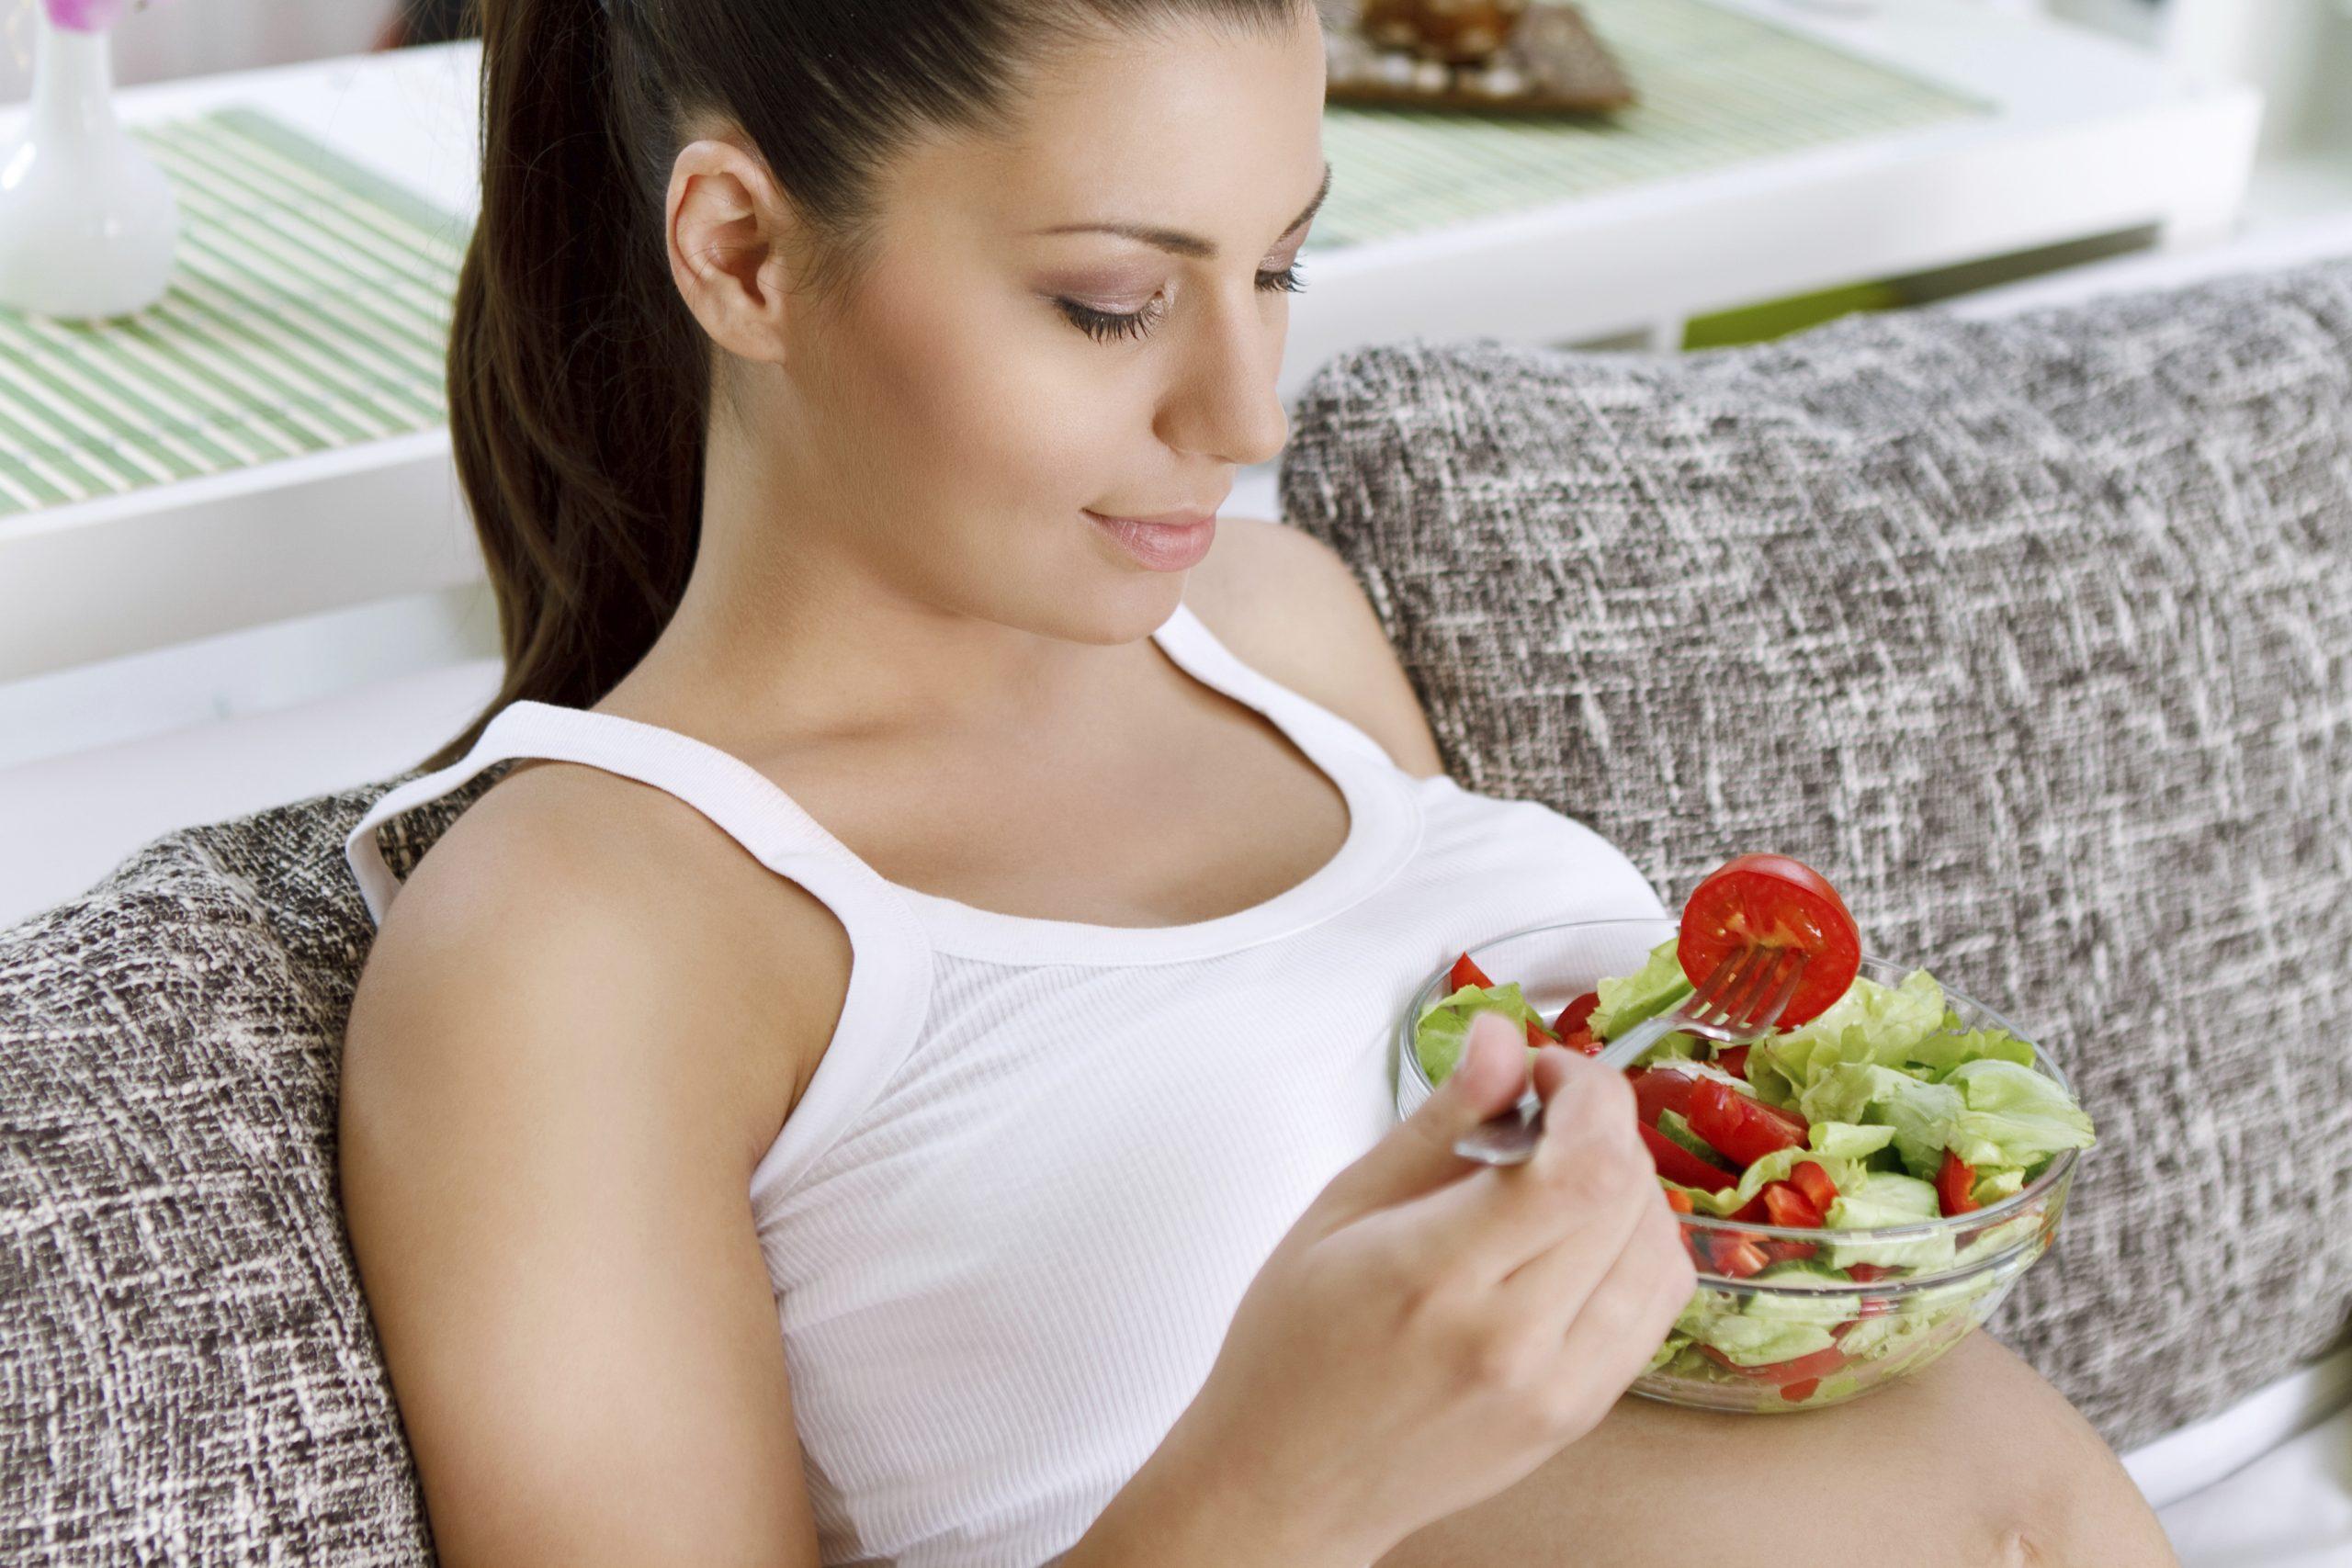 Carenza di ferro in gravidanza: sintomi, conseguenze e alimentazione consigliata